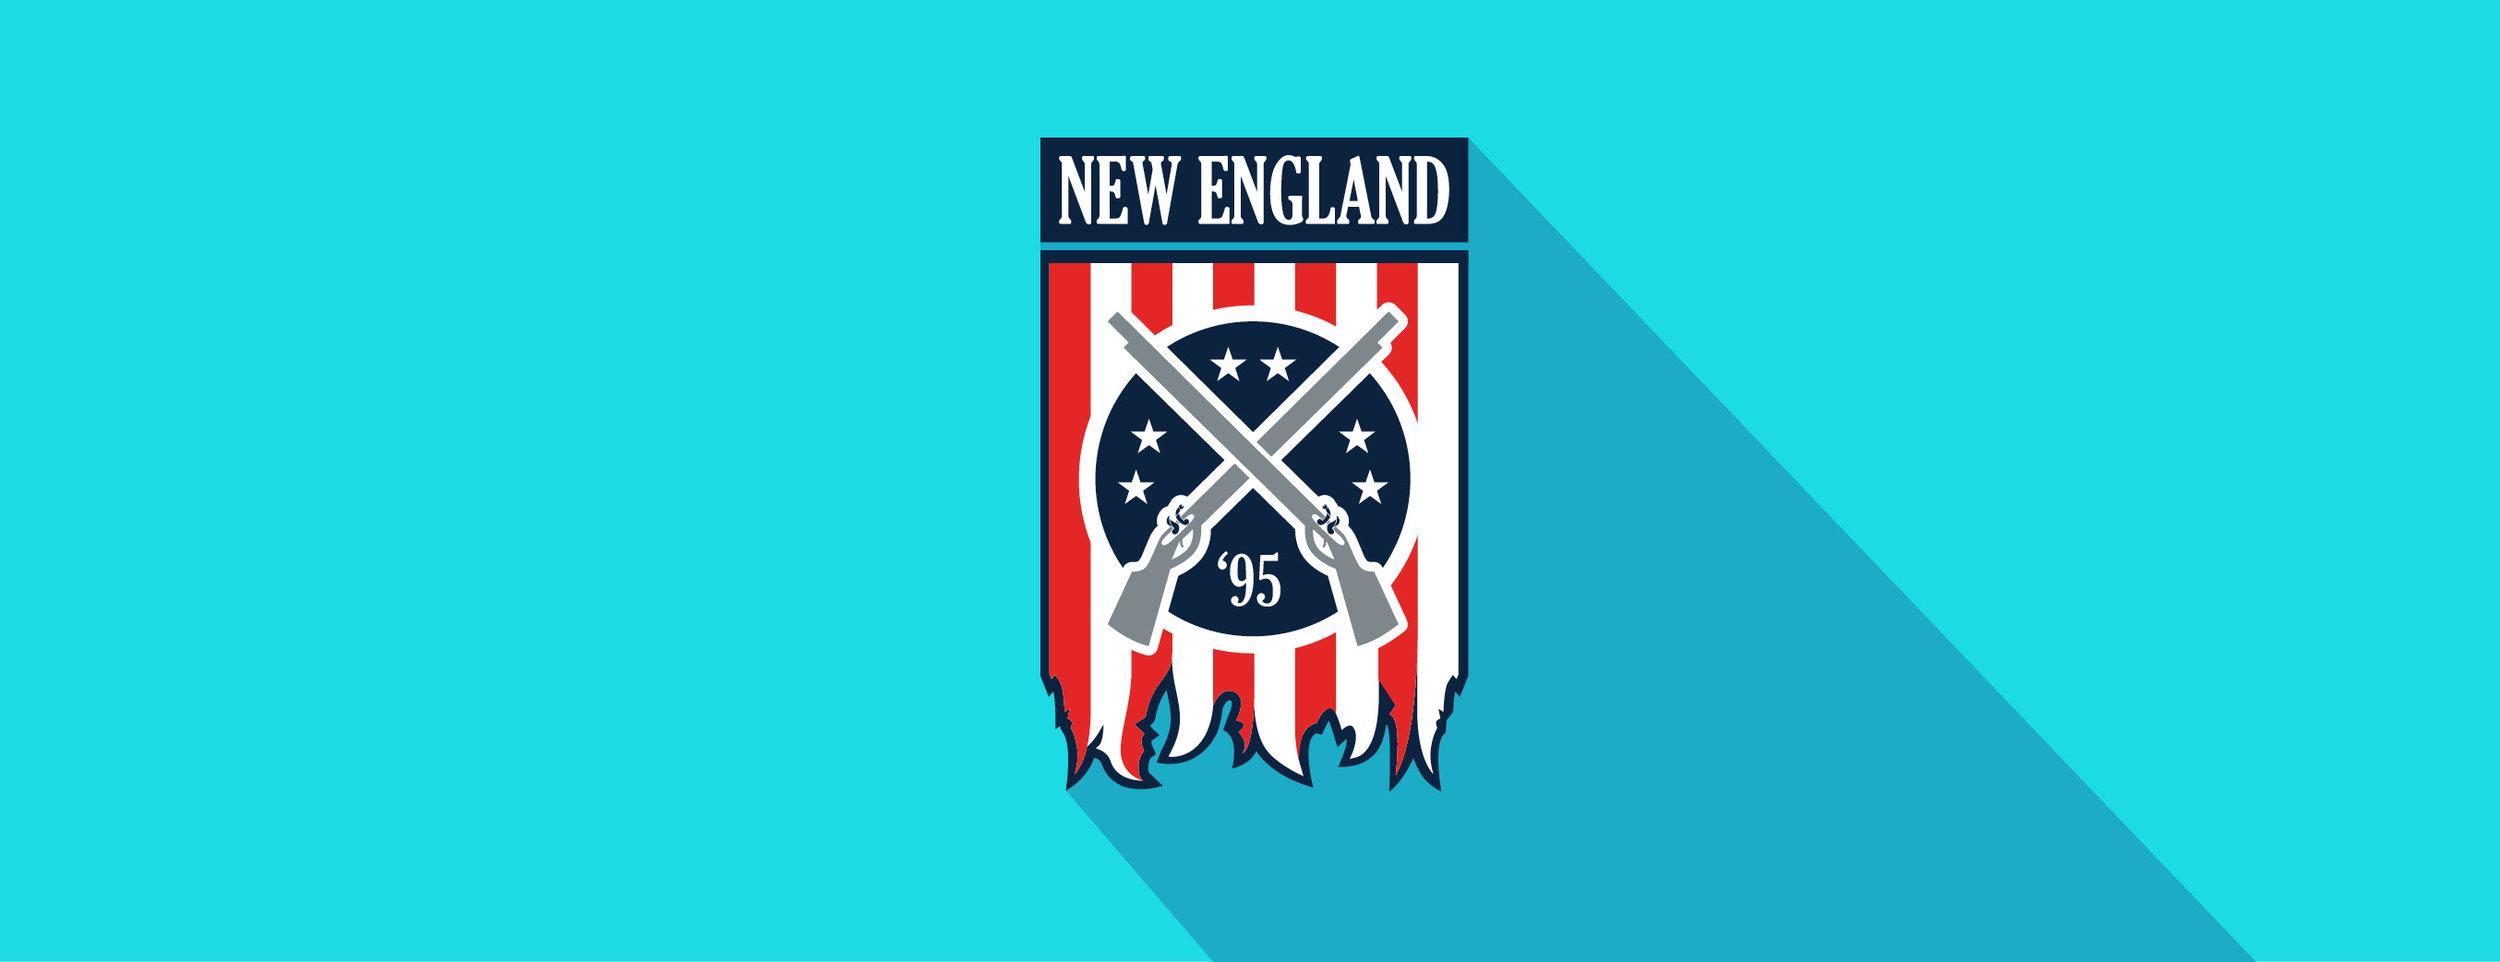 New England Revolution, re-brand mock-up.